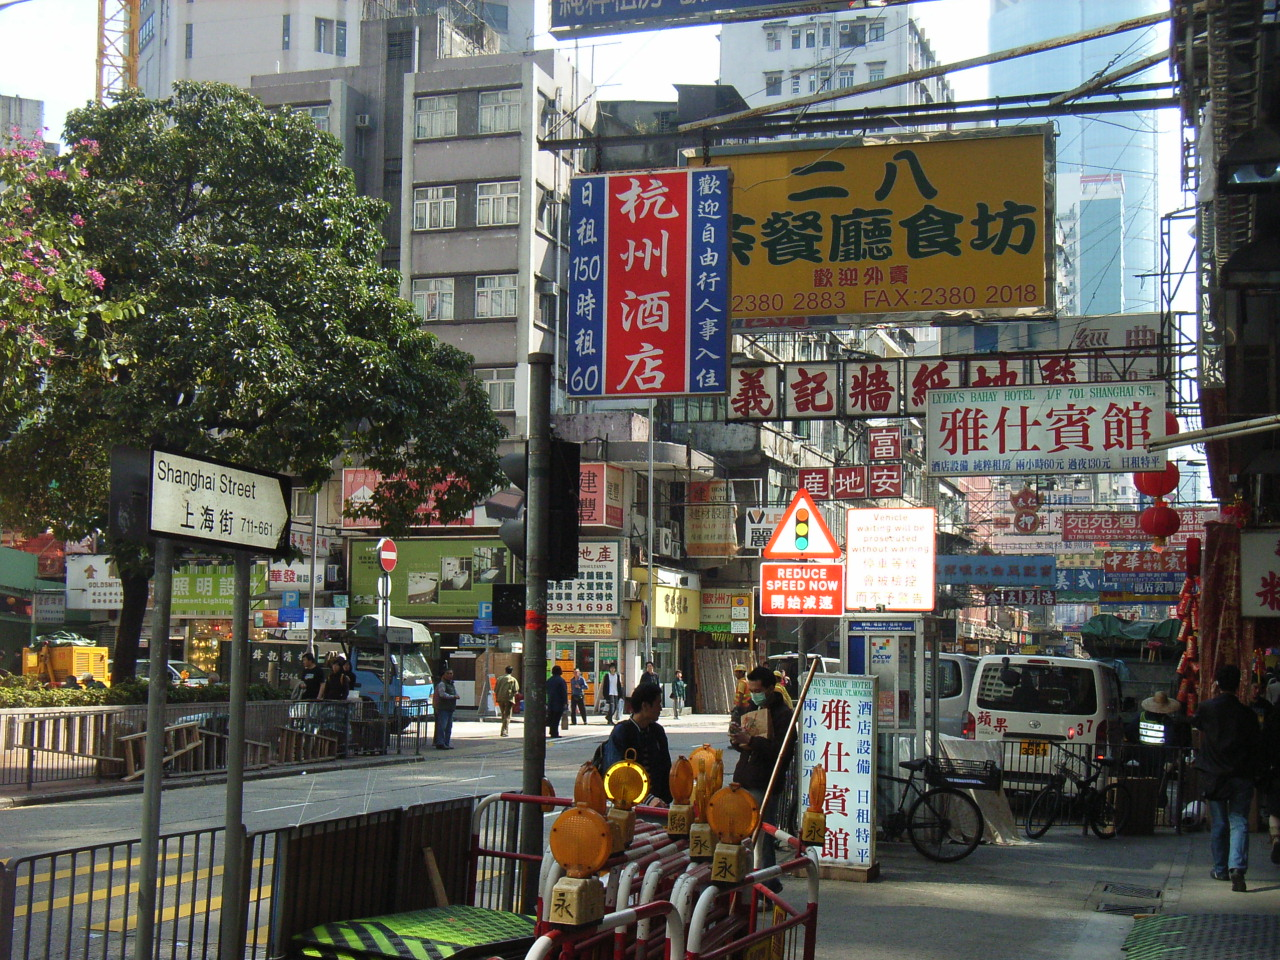 HK_LCK_Lai_Chi_Kok_Road_Shanghai_Street_